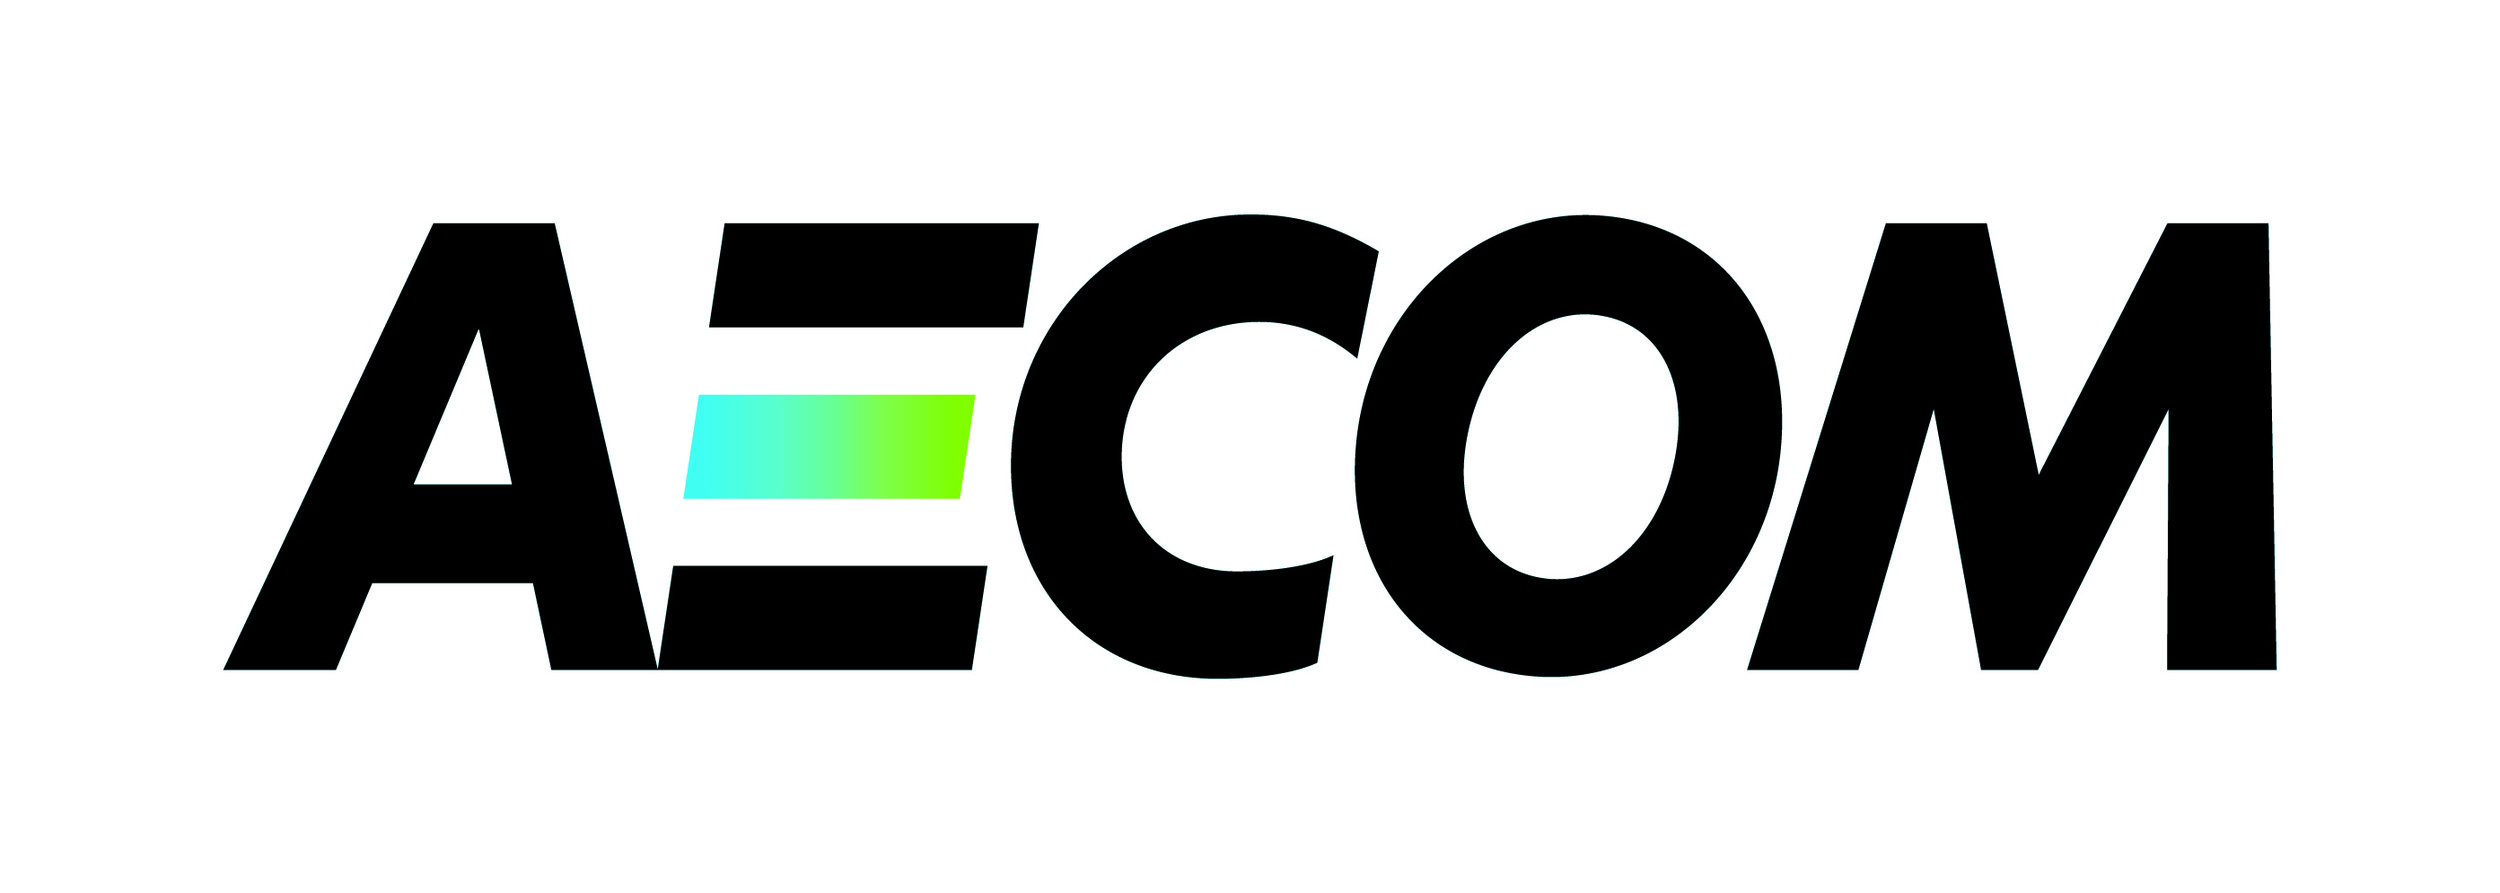 AECOMcolorcmyk.jpg